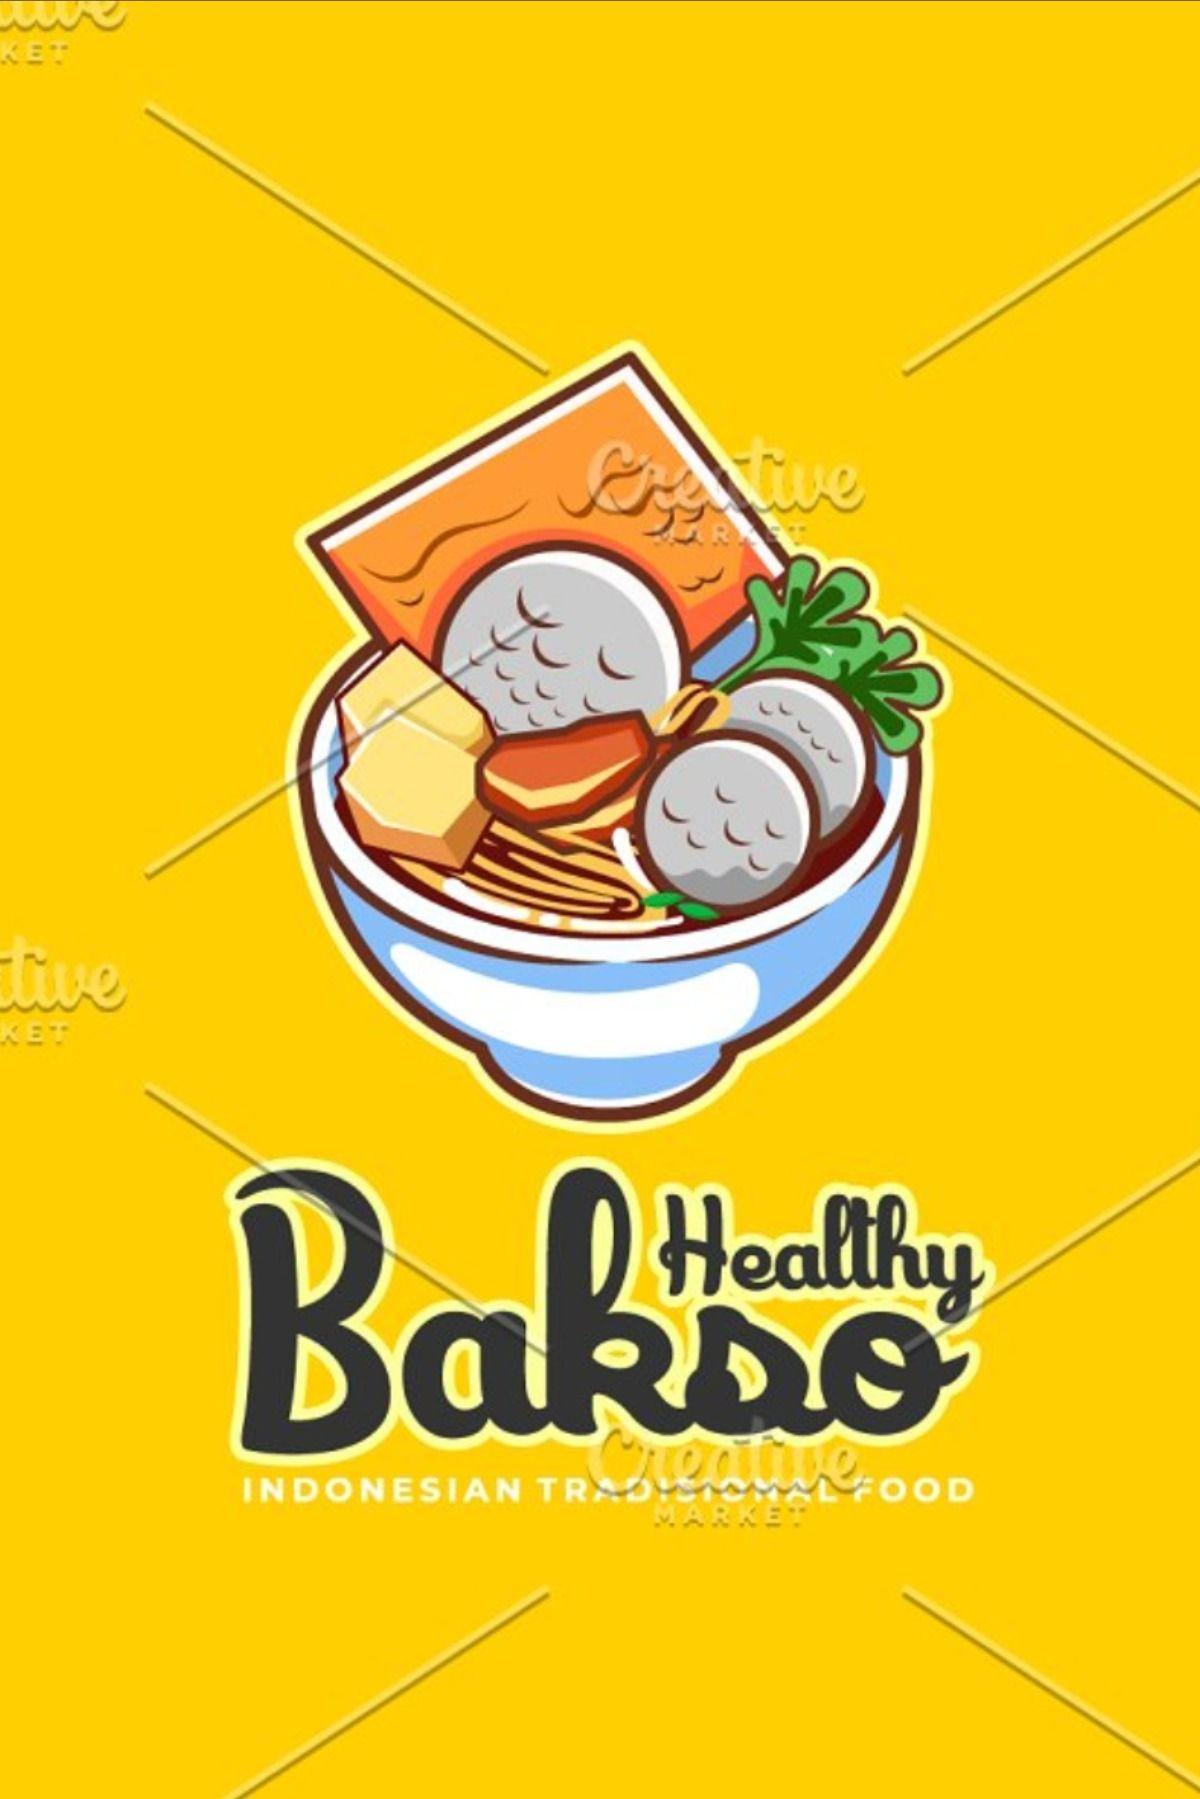 Indonesian Food Logo Design Food logo design, Logo food